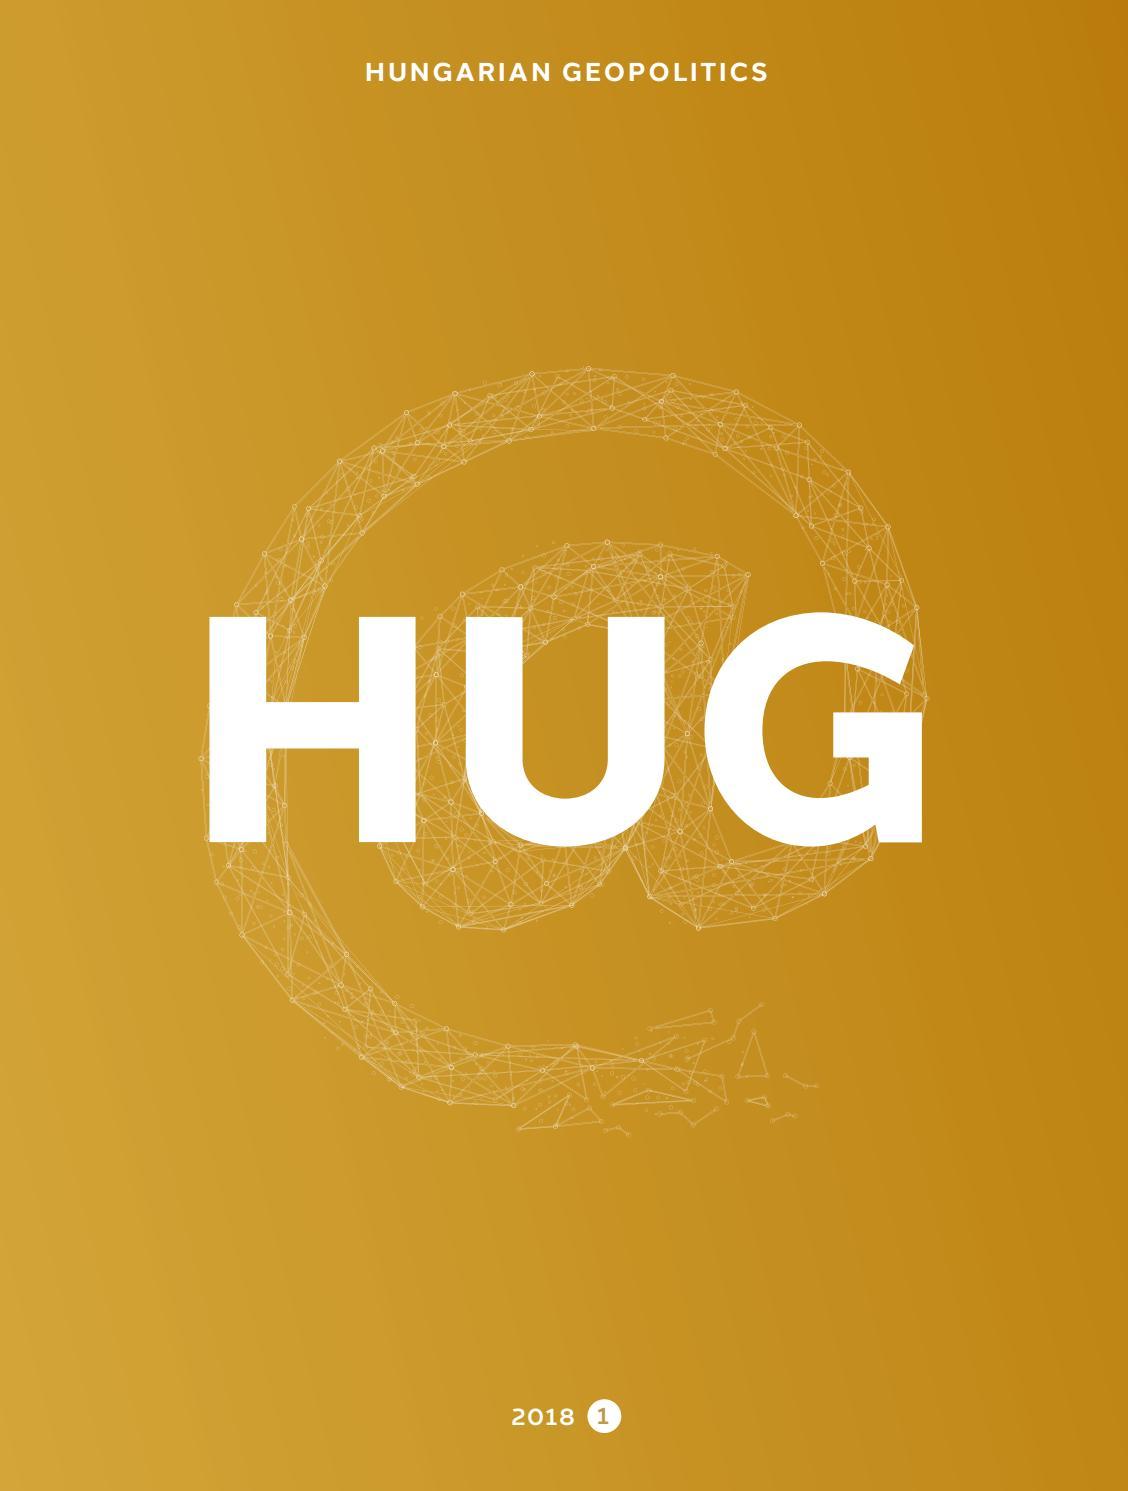 HUG Magazin 2018 - 1. szám (№9) by PAIGEO - Pallas Athene Innovation and  Geopolitical Foundation - issuu 5973619216